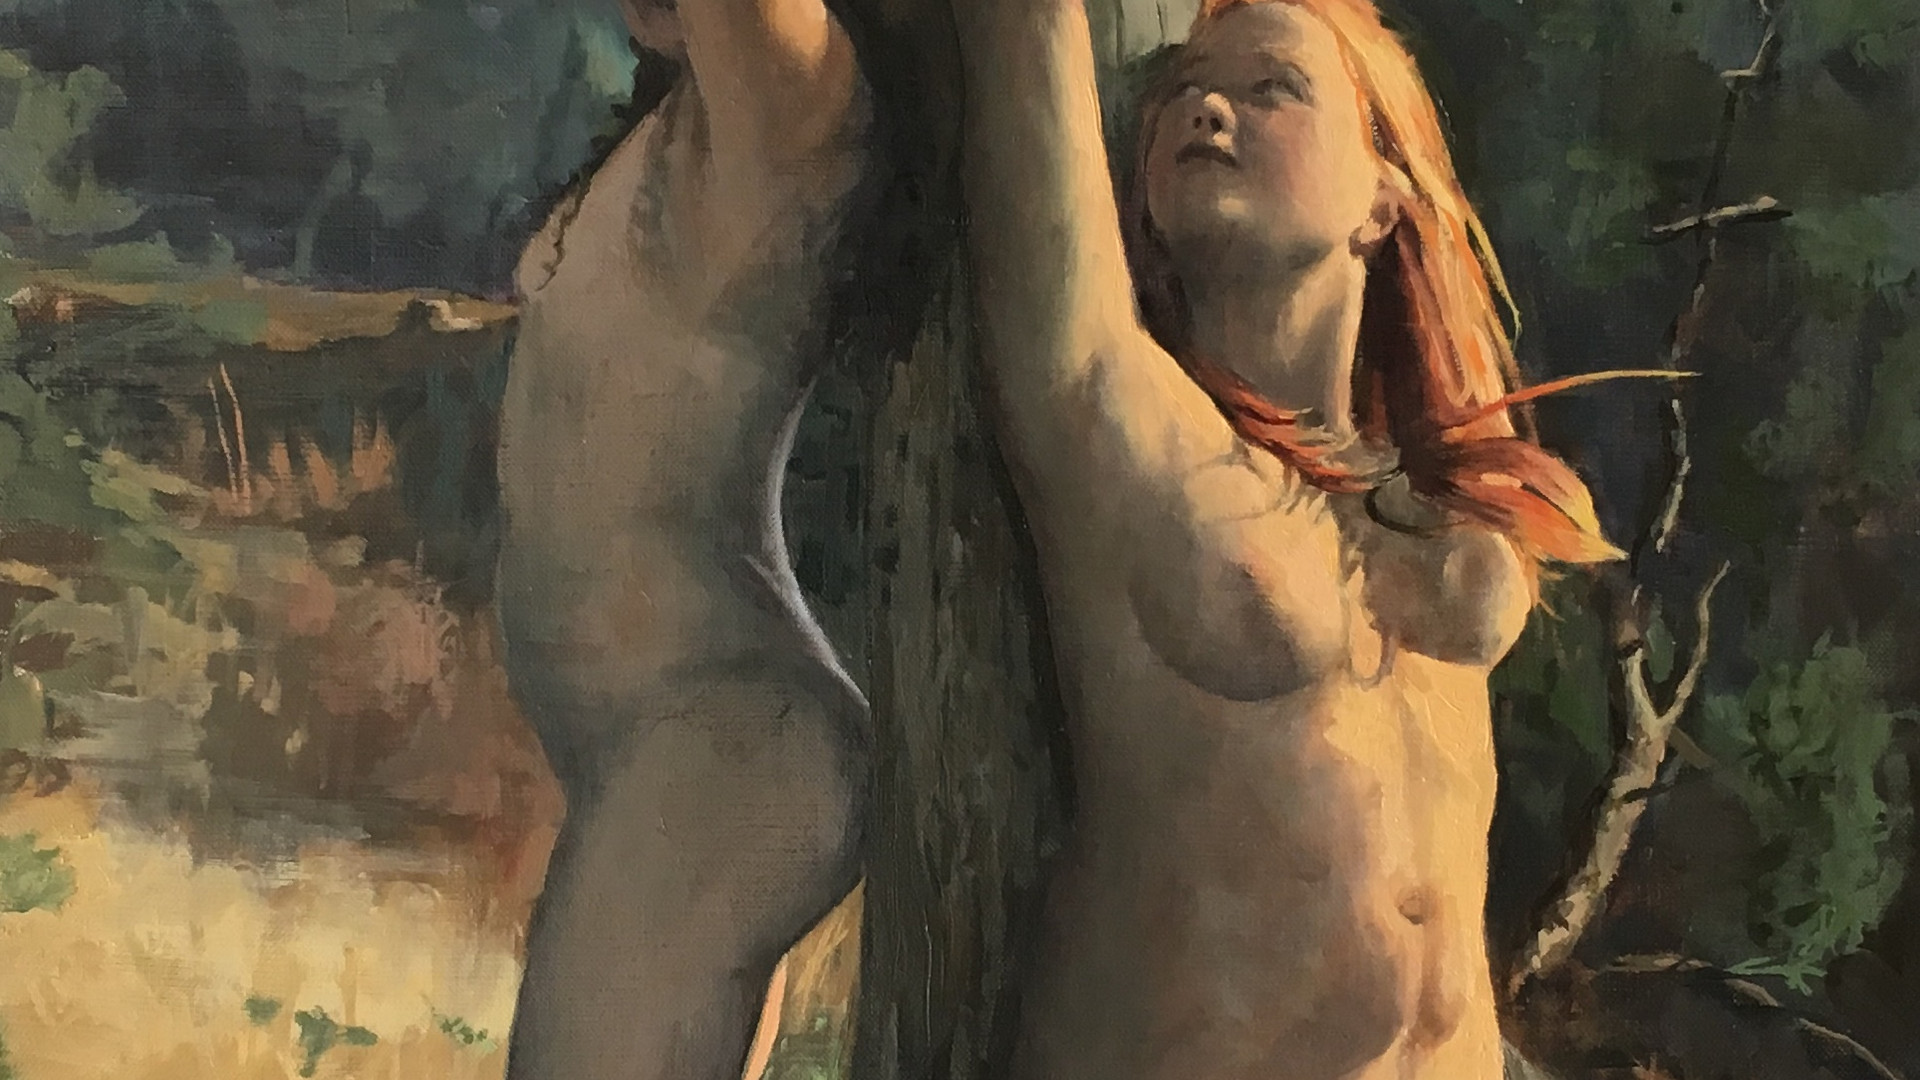 Sacrifice of the virgins  at giebenhinom